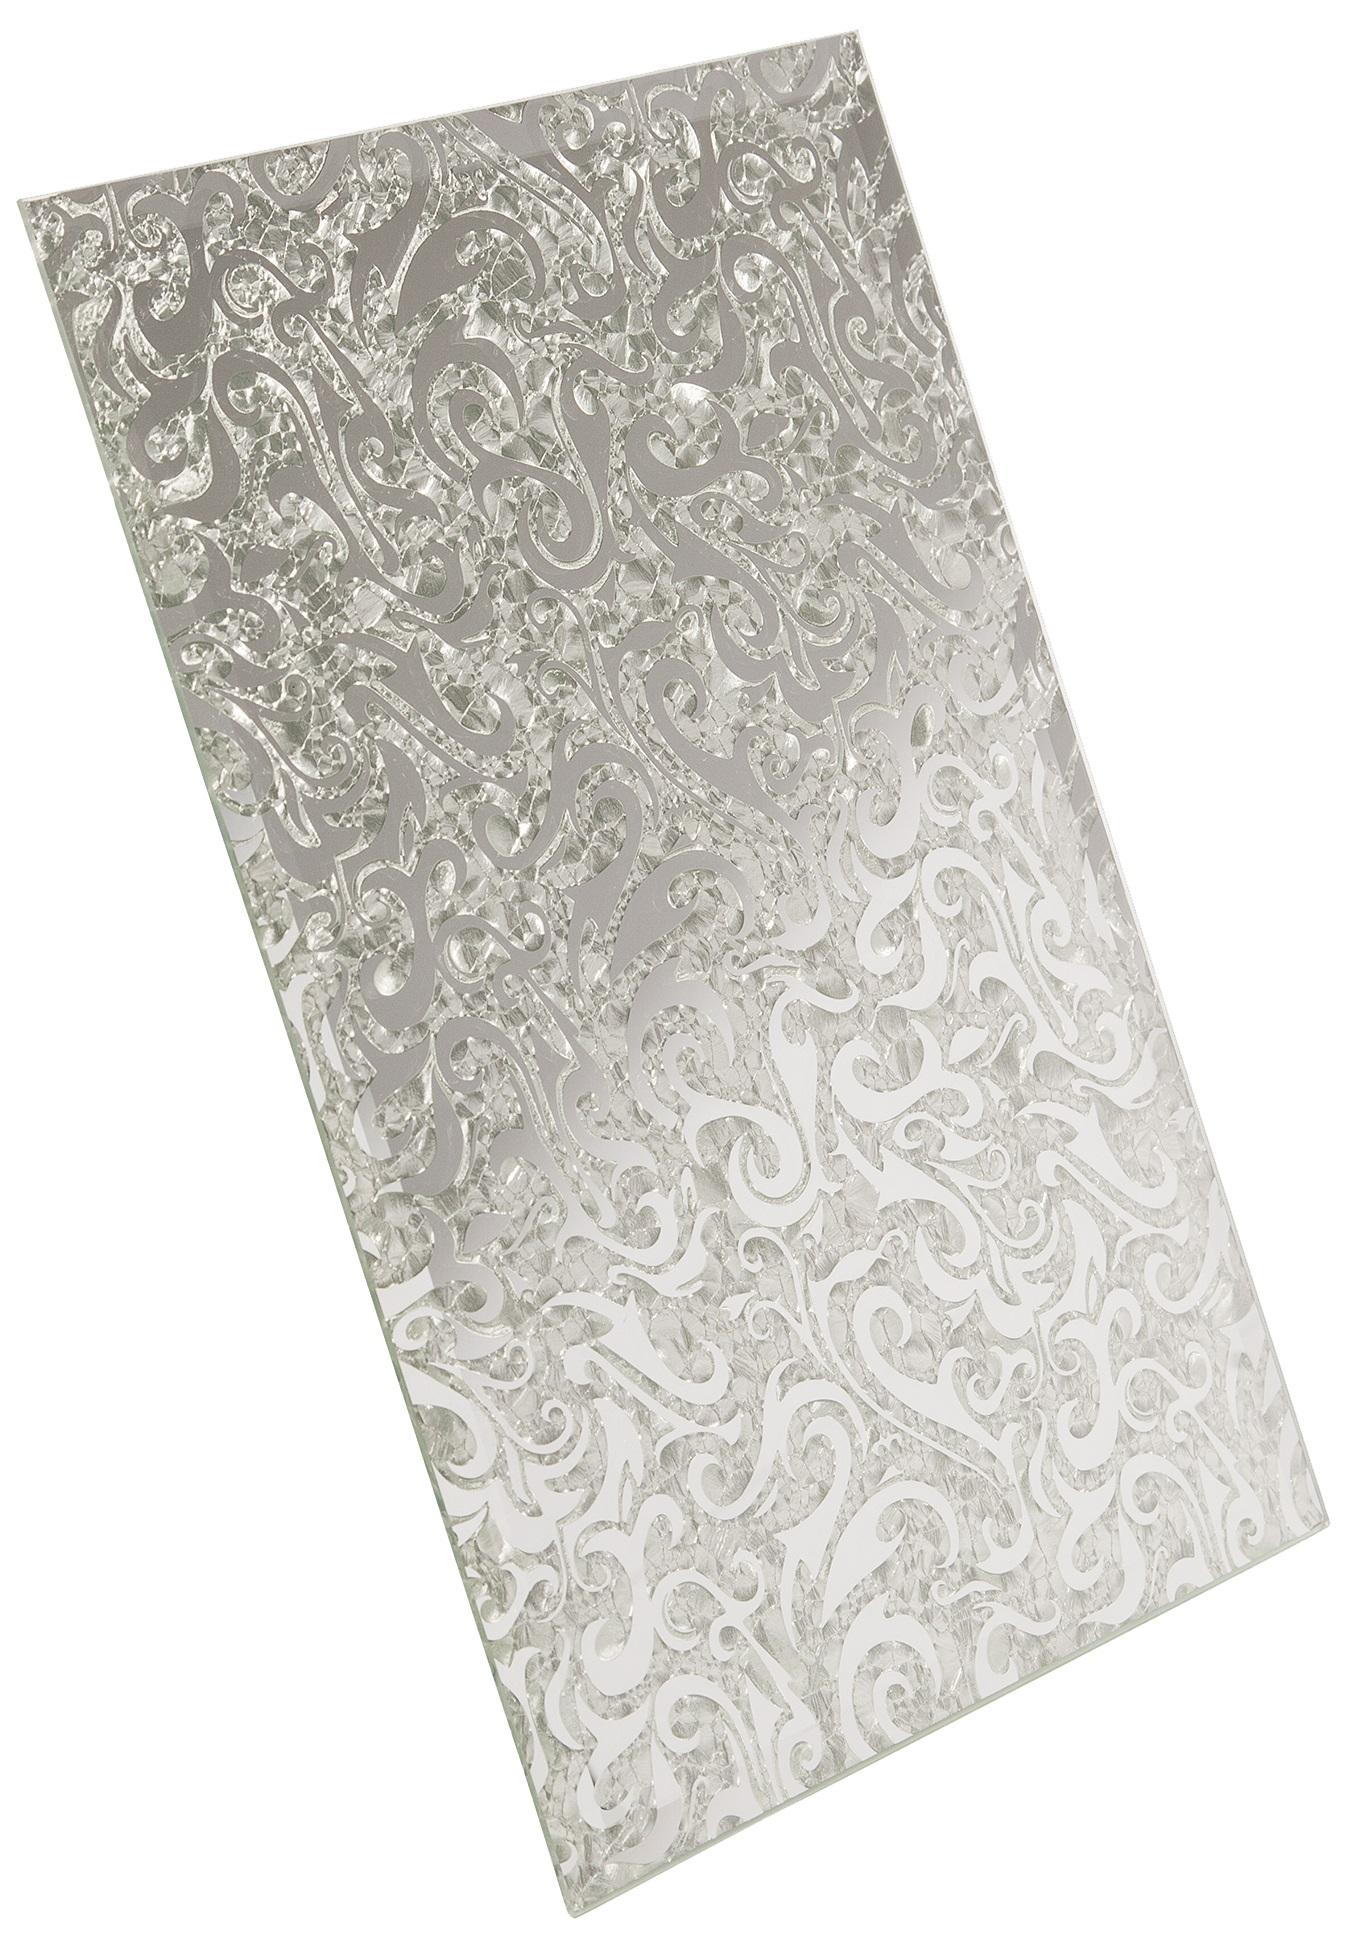 Плитка зеркальная серебряная Алладин-2 ПЗСАл-2 - 250х400 мм/10шт мозаичный декор дст зеркальная бронза 2 5x2 5 30x30